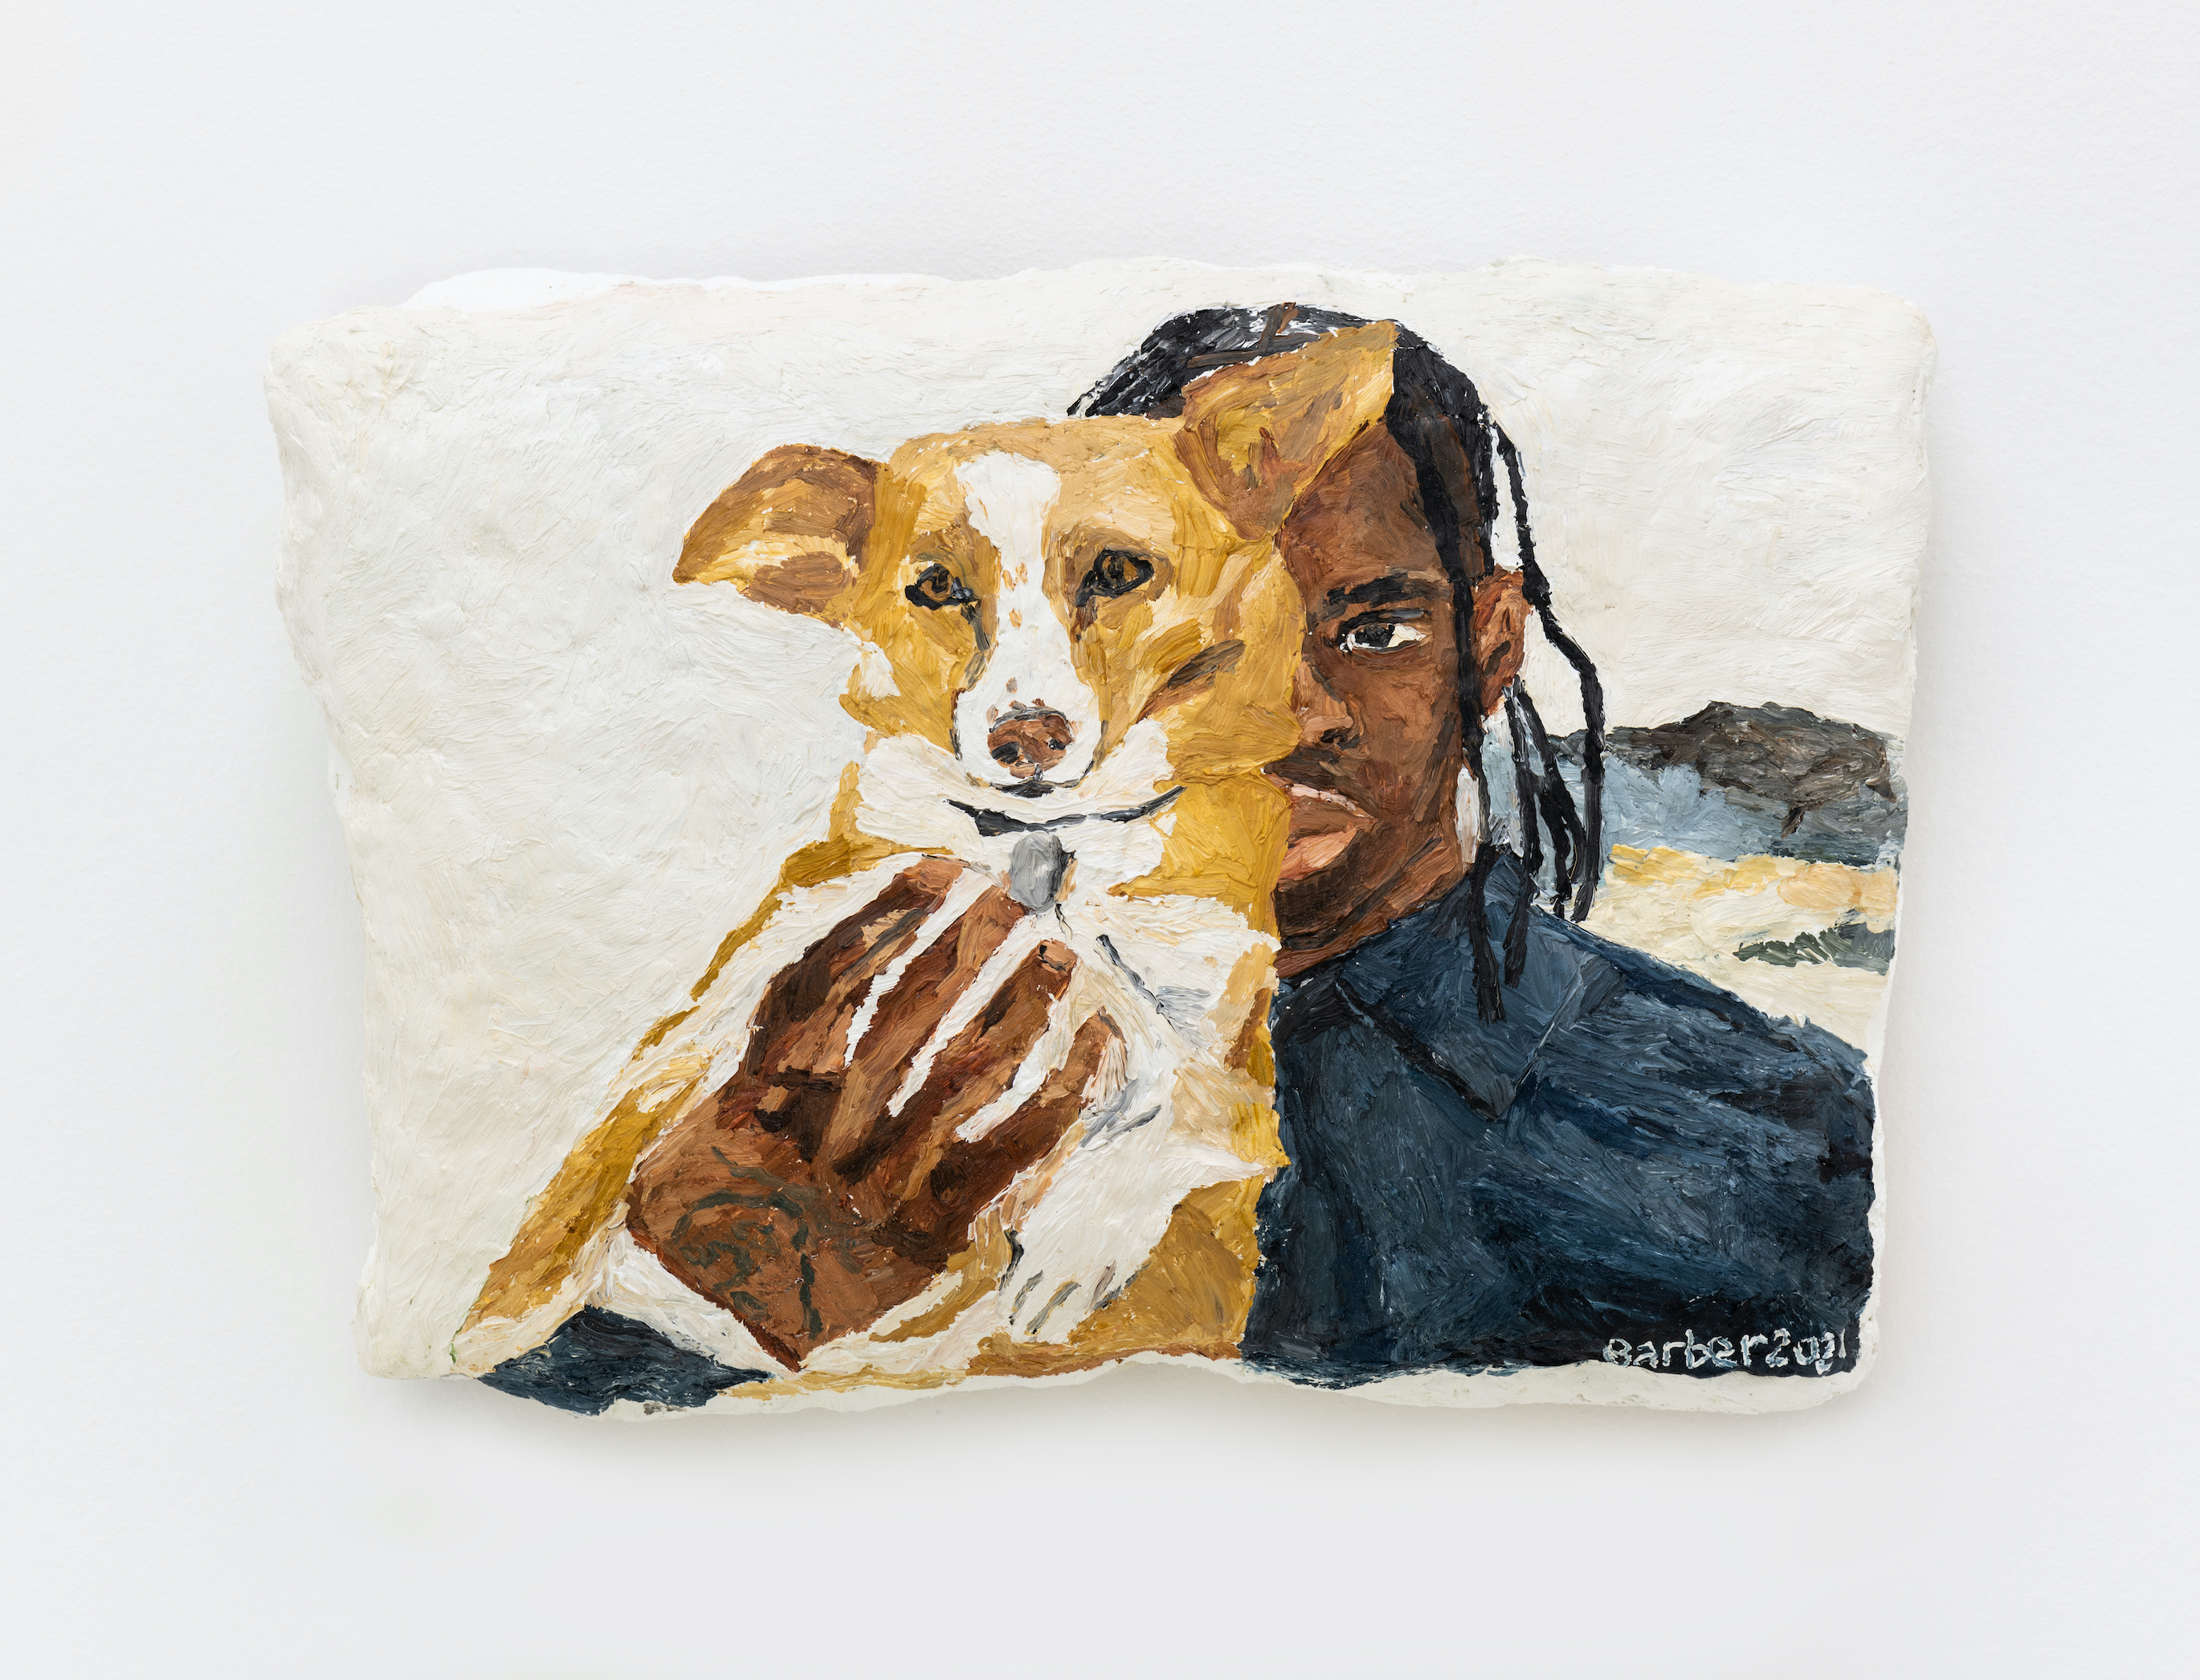 Sophie Barber, Travis Scott holding a corgi, 2021. Oil on canvas, 8 x 12 1⁄8 x 3 3⁄8 in (20.2 x 30.5 x 8.5 cm)